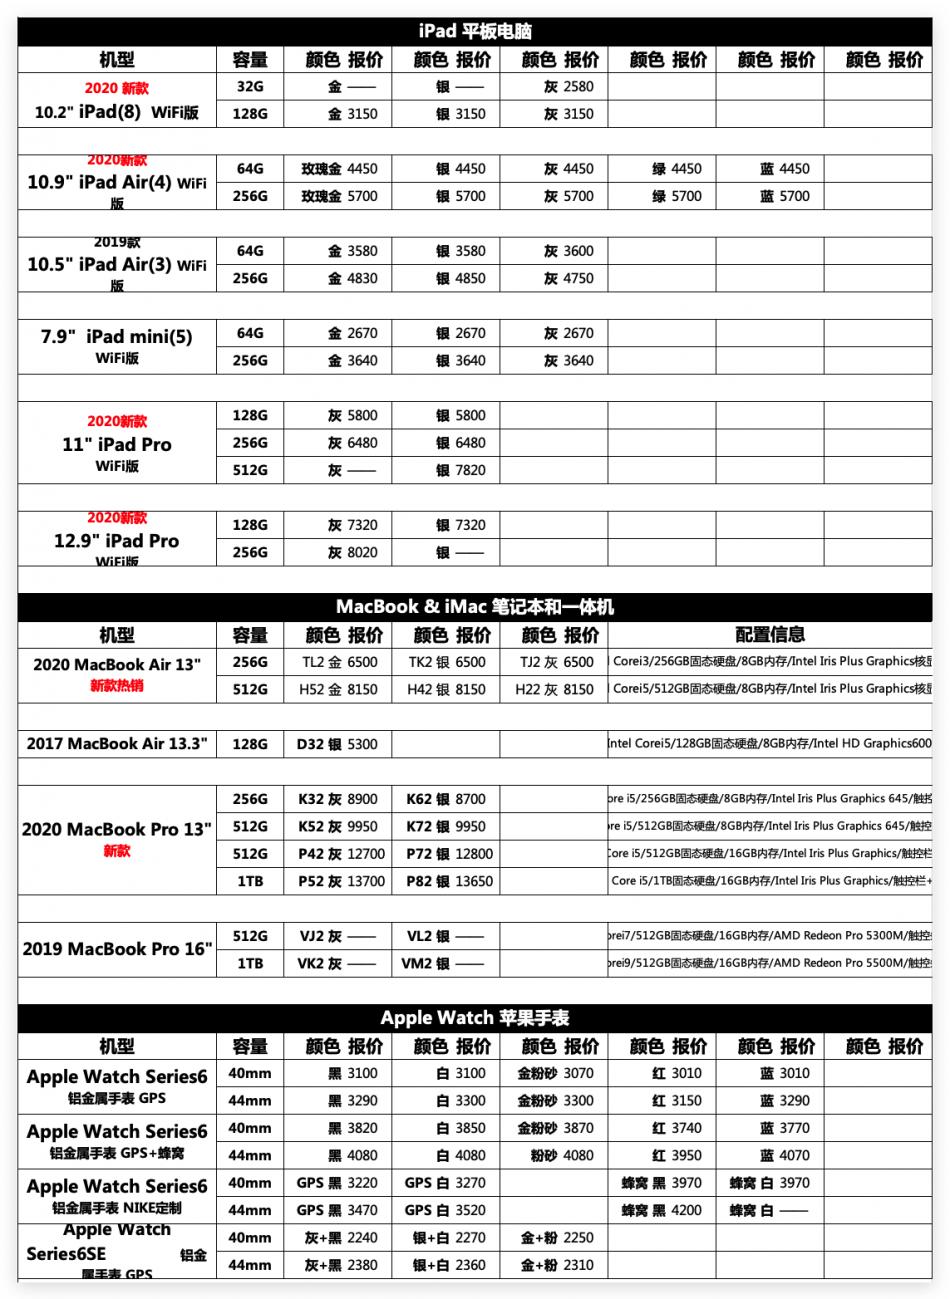 Xnip2020-11-17_15-24-00.png